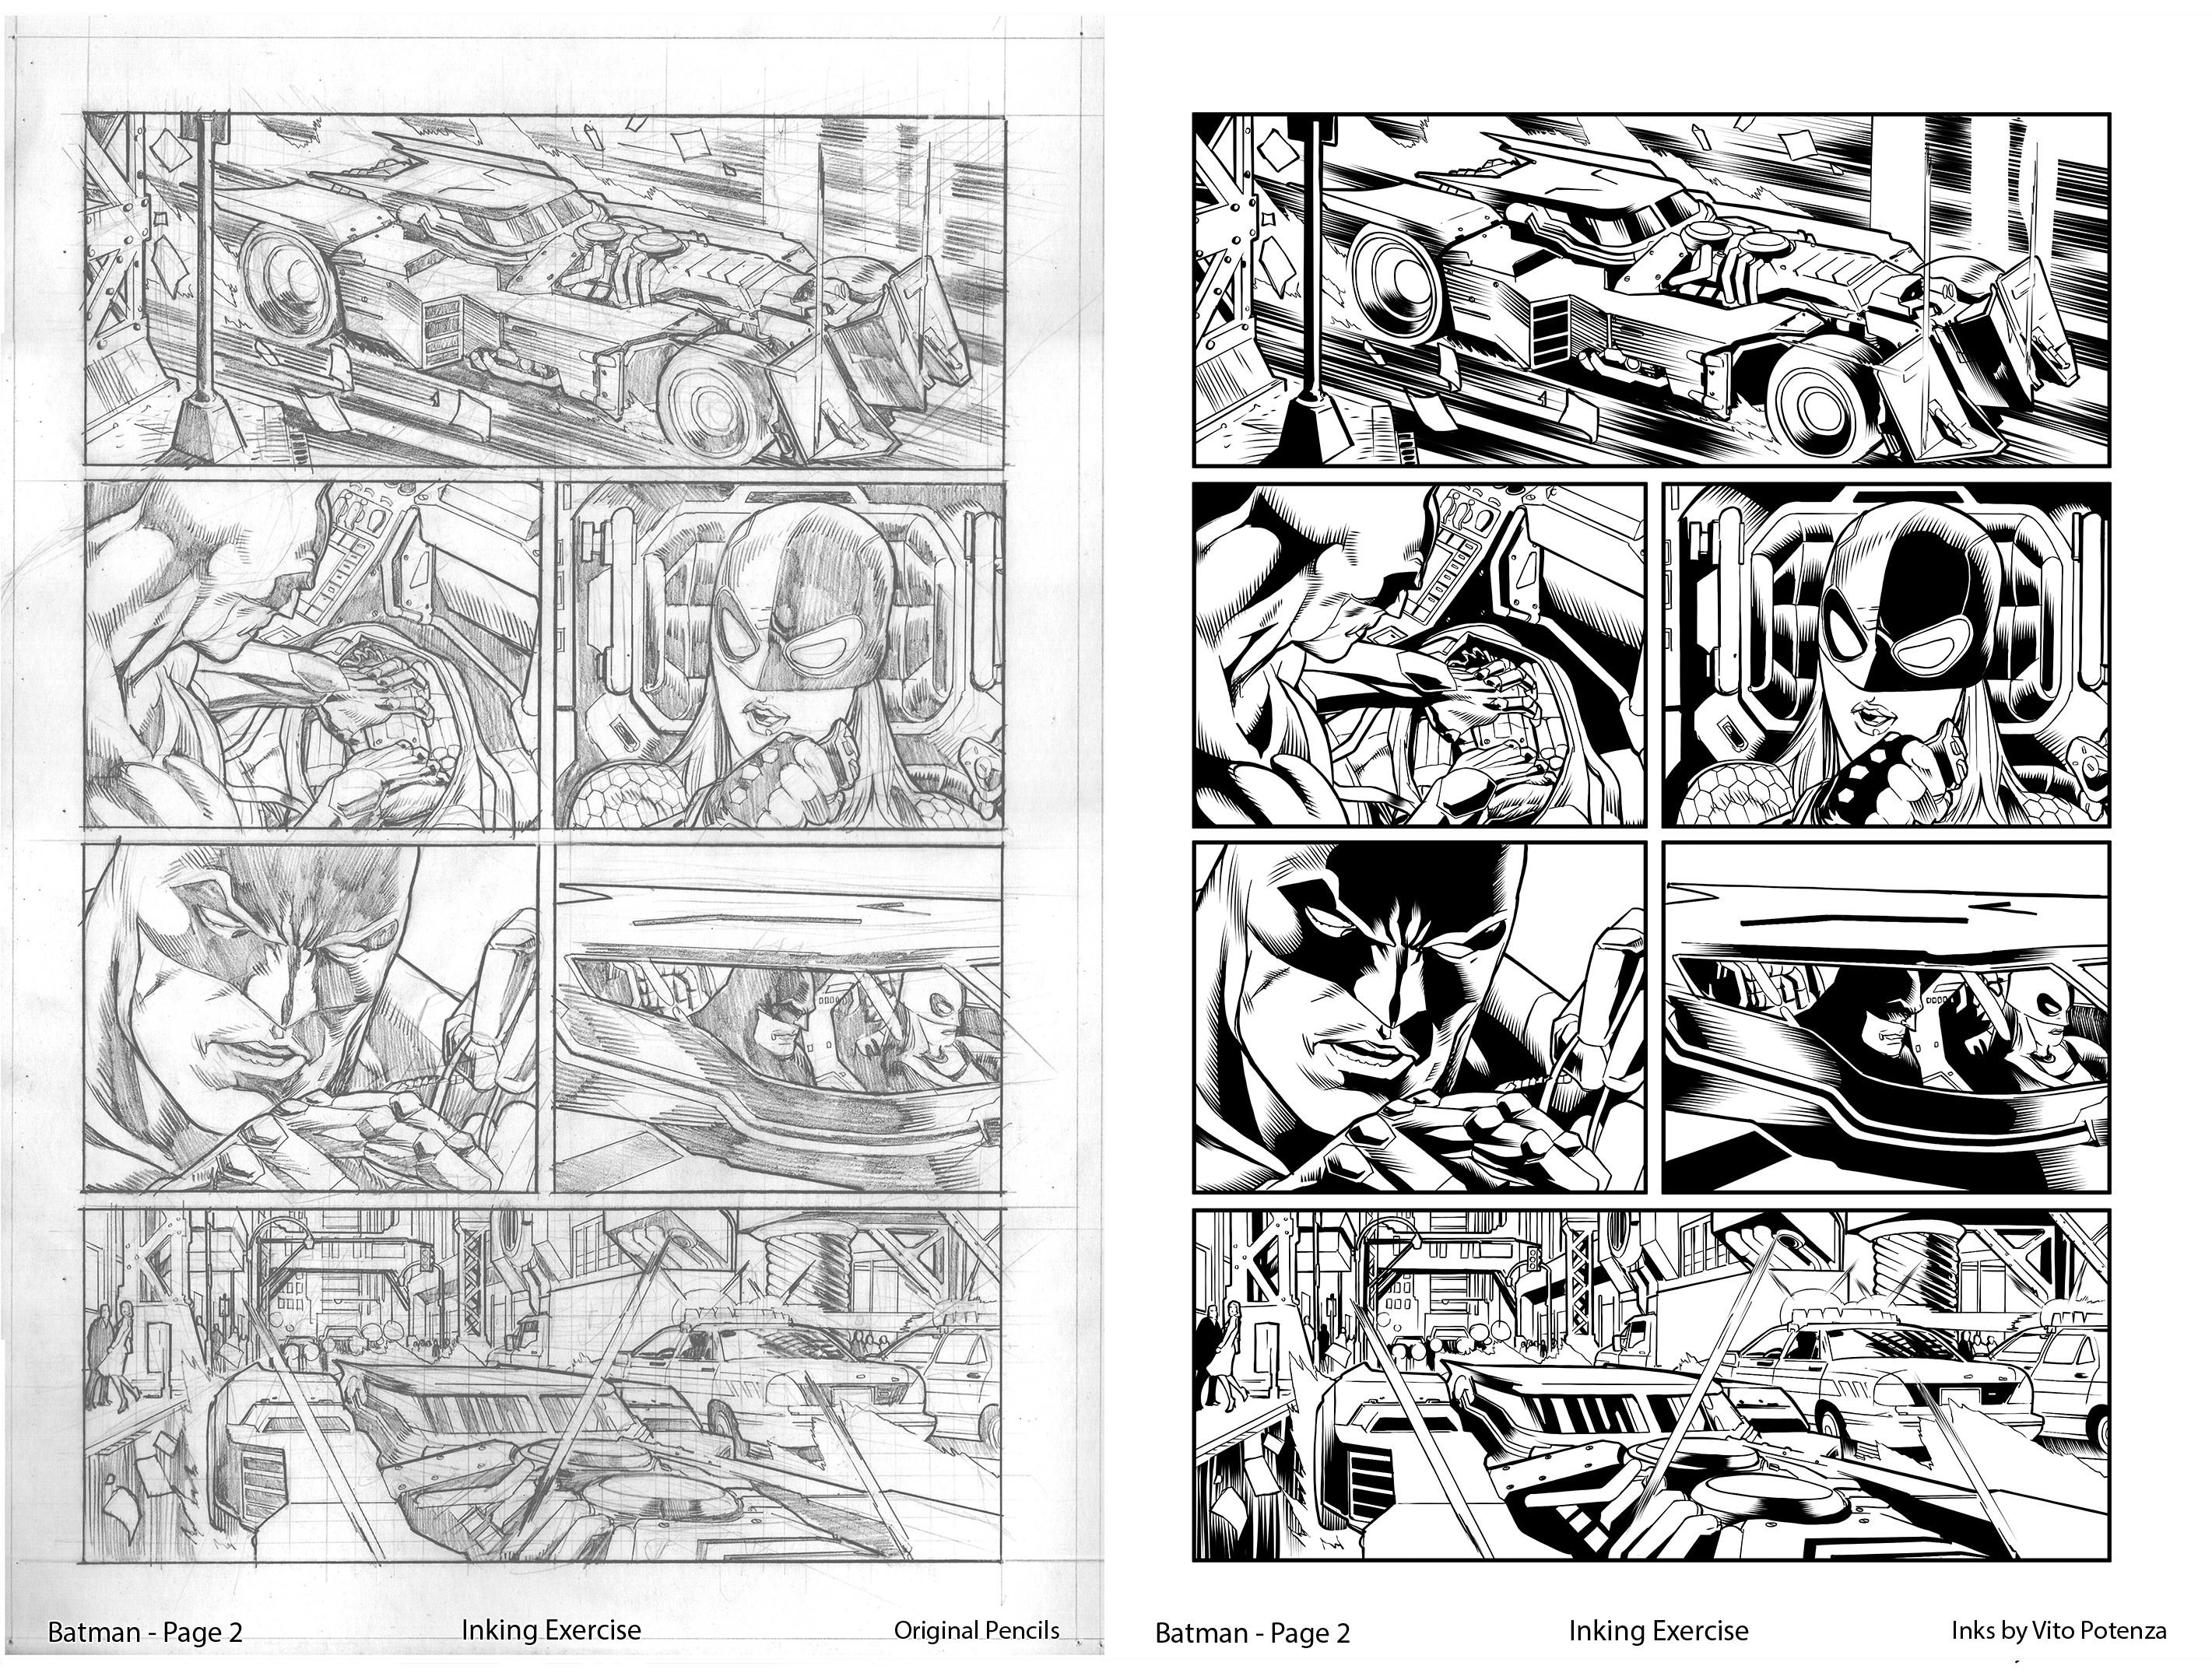 Batman Page 2 - Inked by me